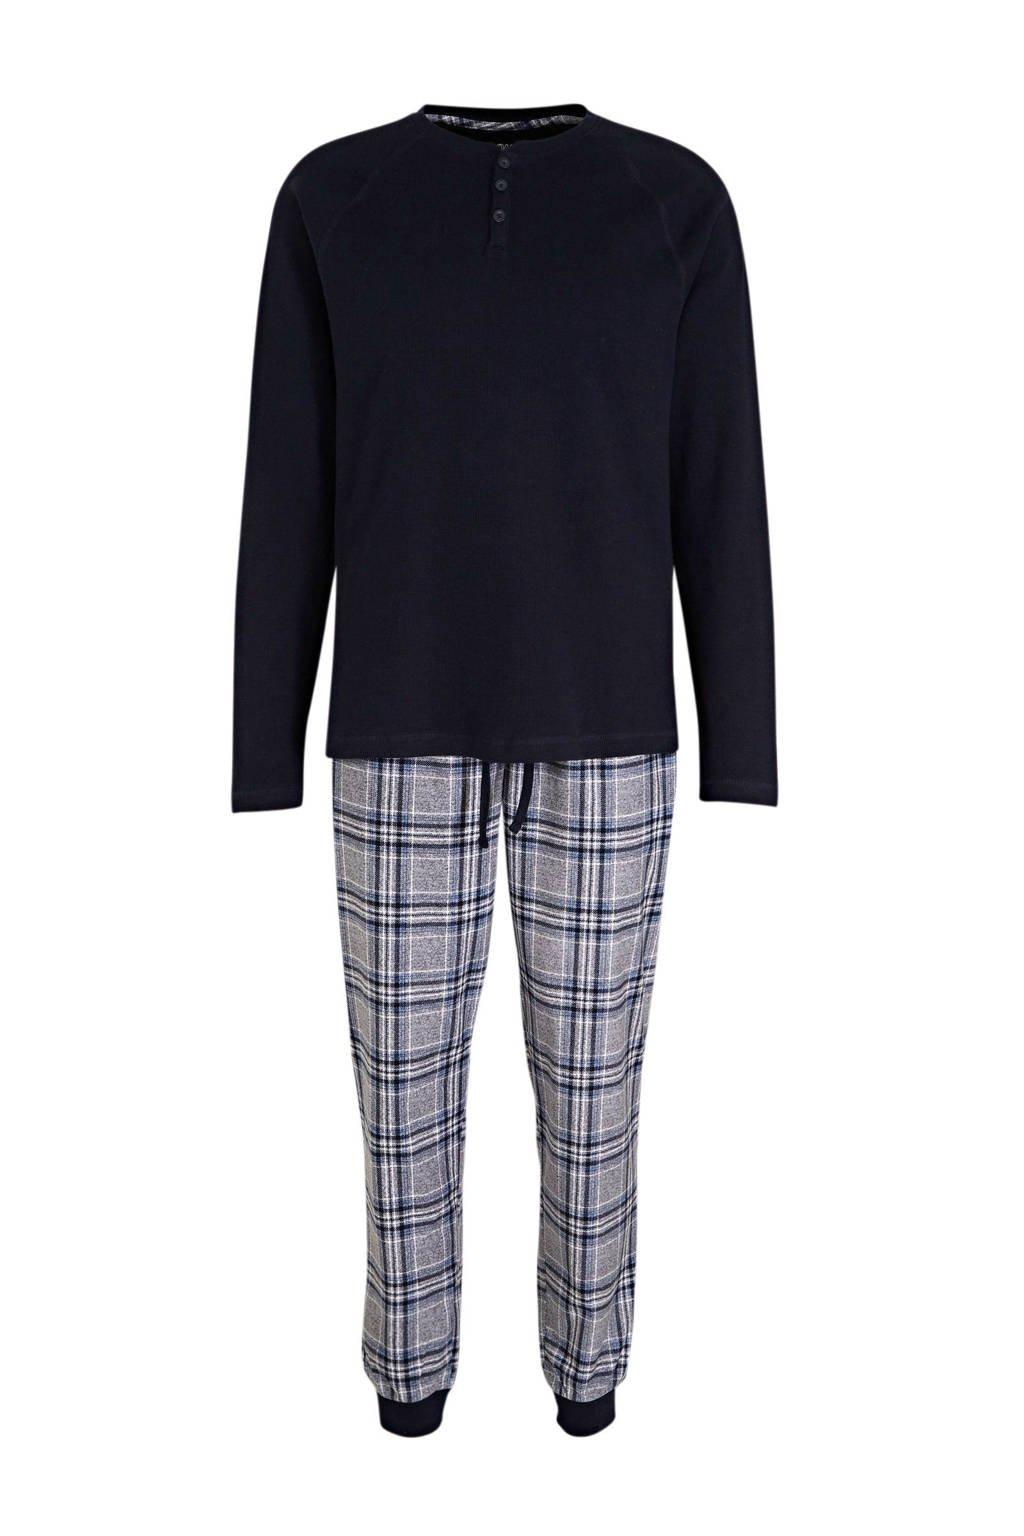 C&A Angelo Litrico pyjama met ruit donkerblauw/grijs, Donkerblauw